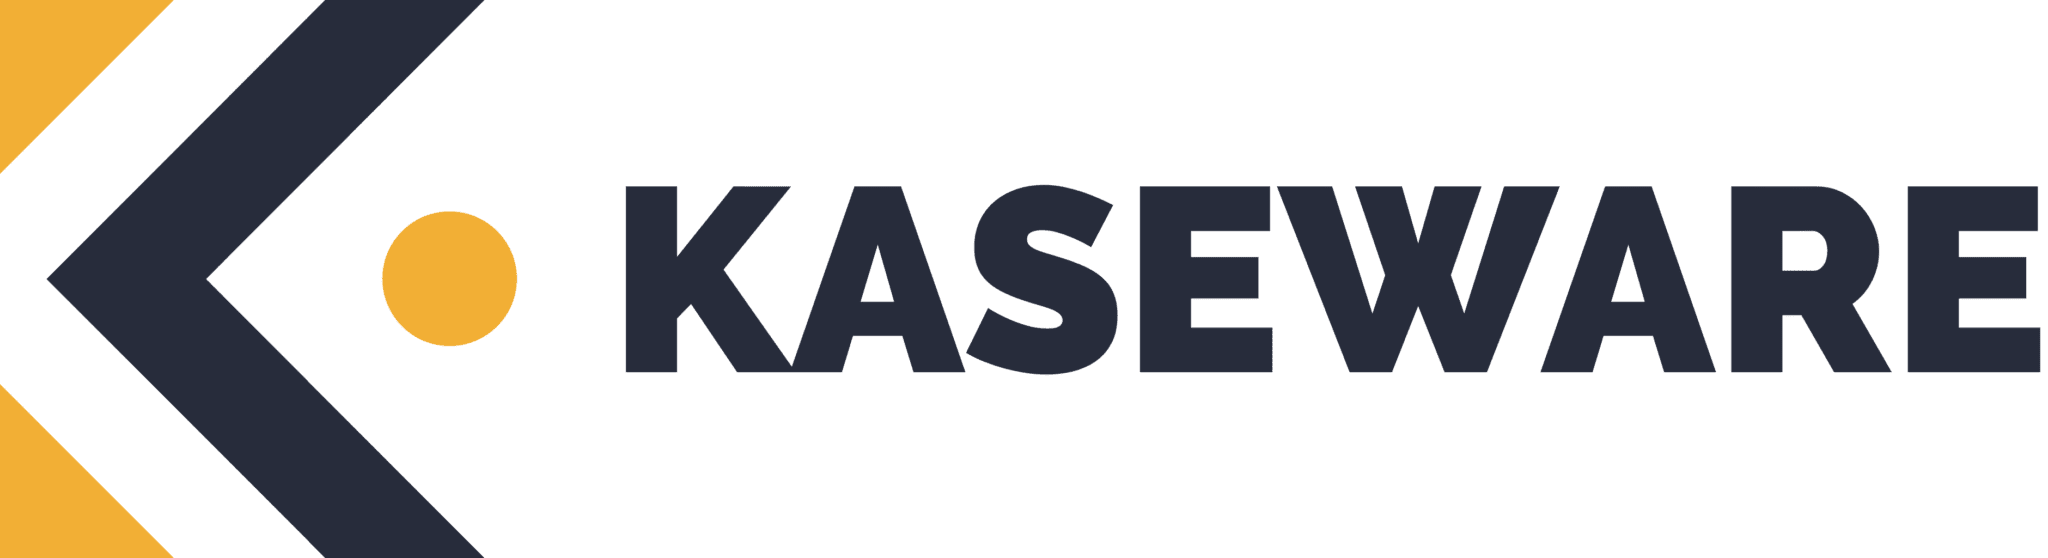 Kaseware Integrates ShadowDragon's SocialNet Forensics Tool into Case Management Investigative Platform